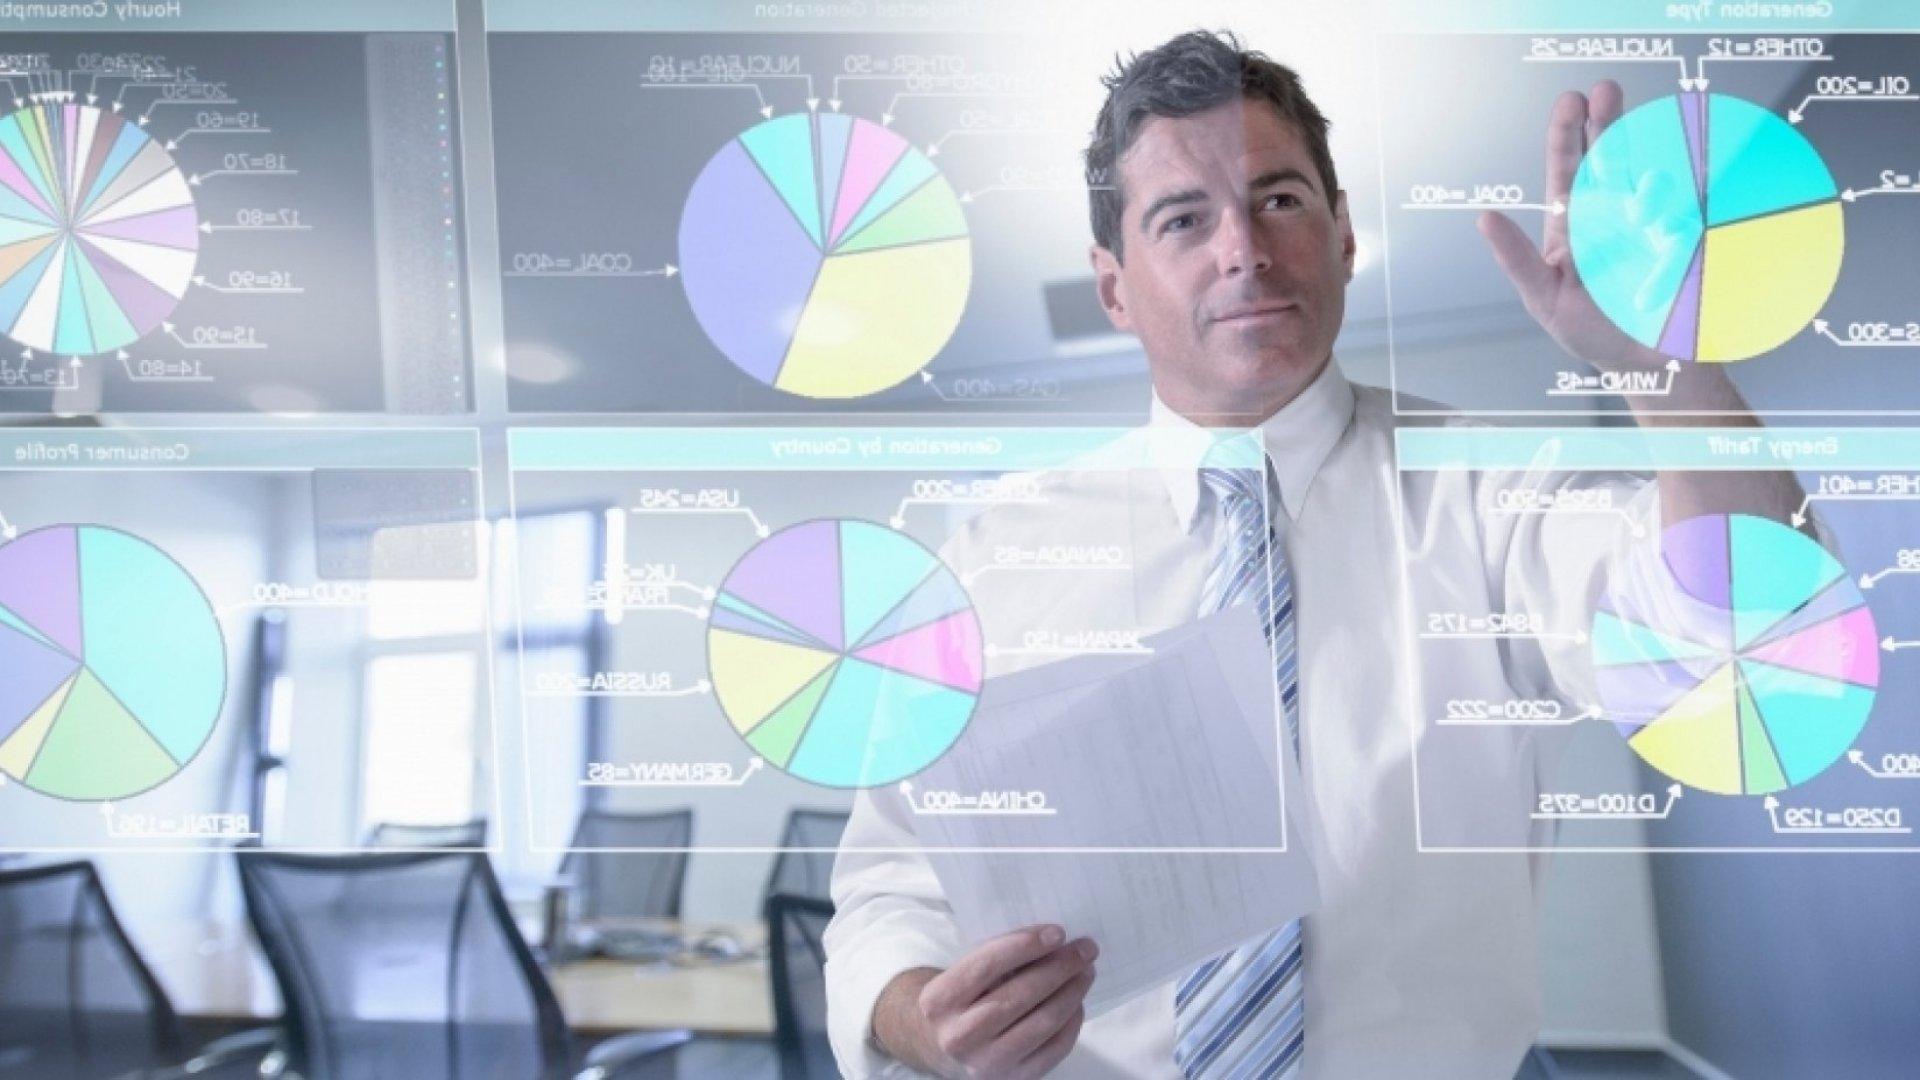 Turn Big Data Into Smart Data With Good Data